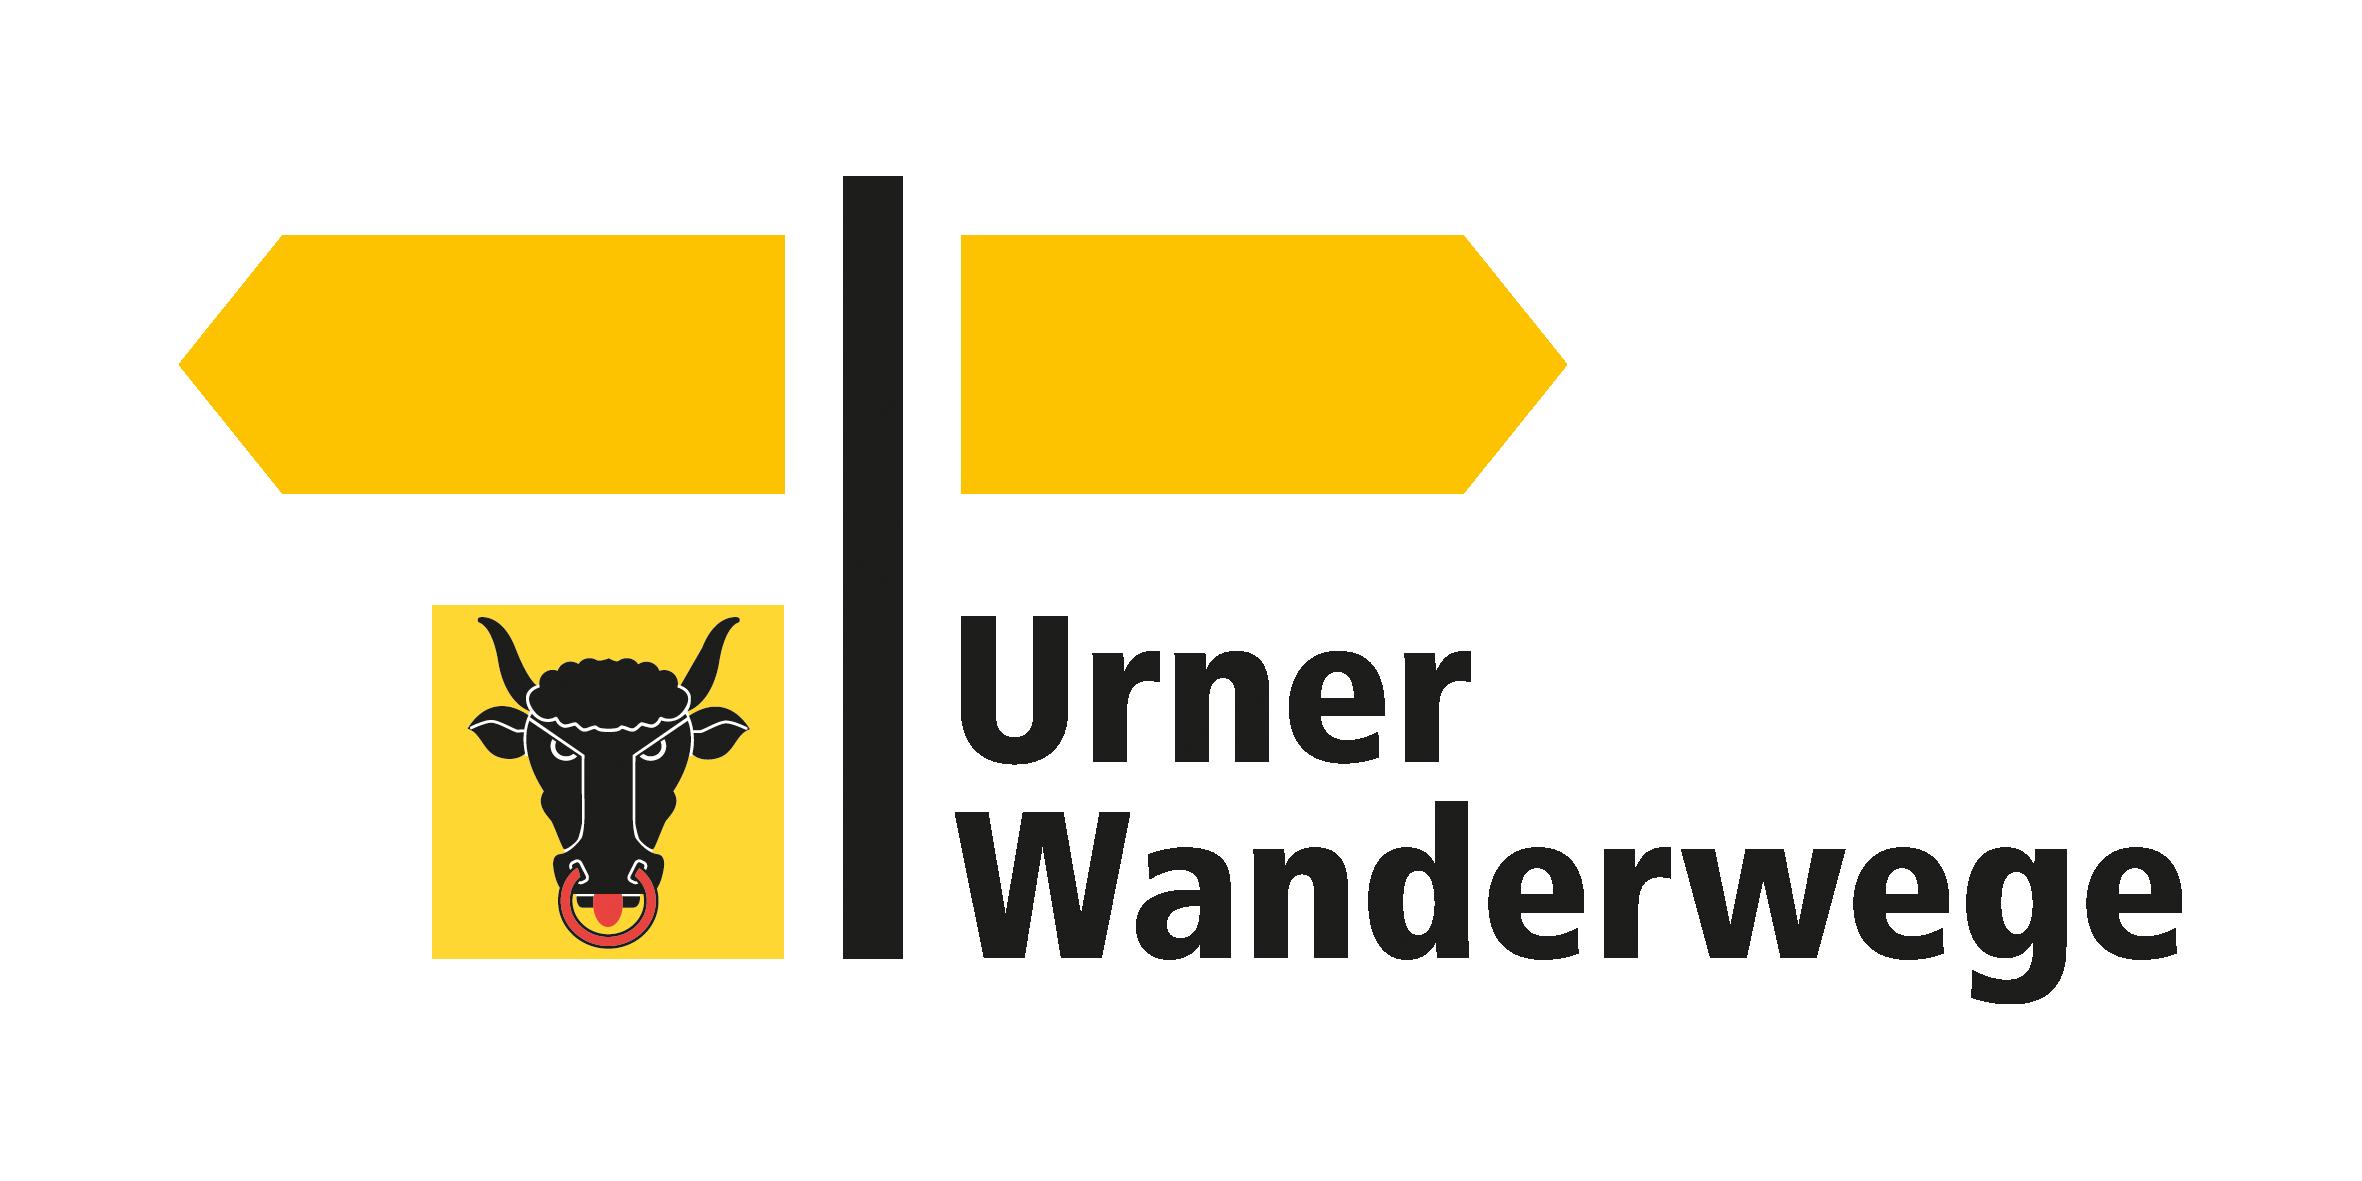 Urner Wanderwege